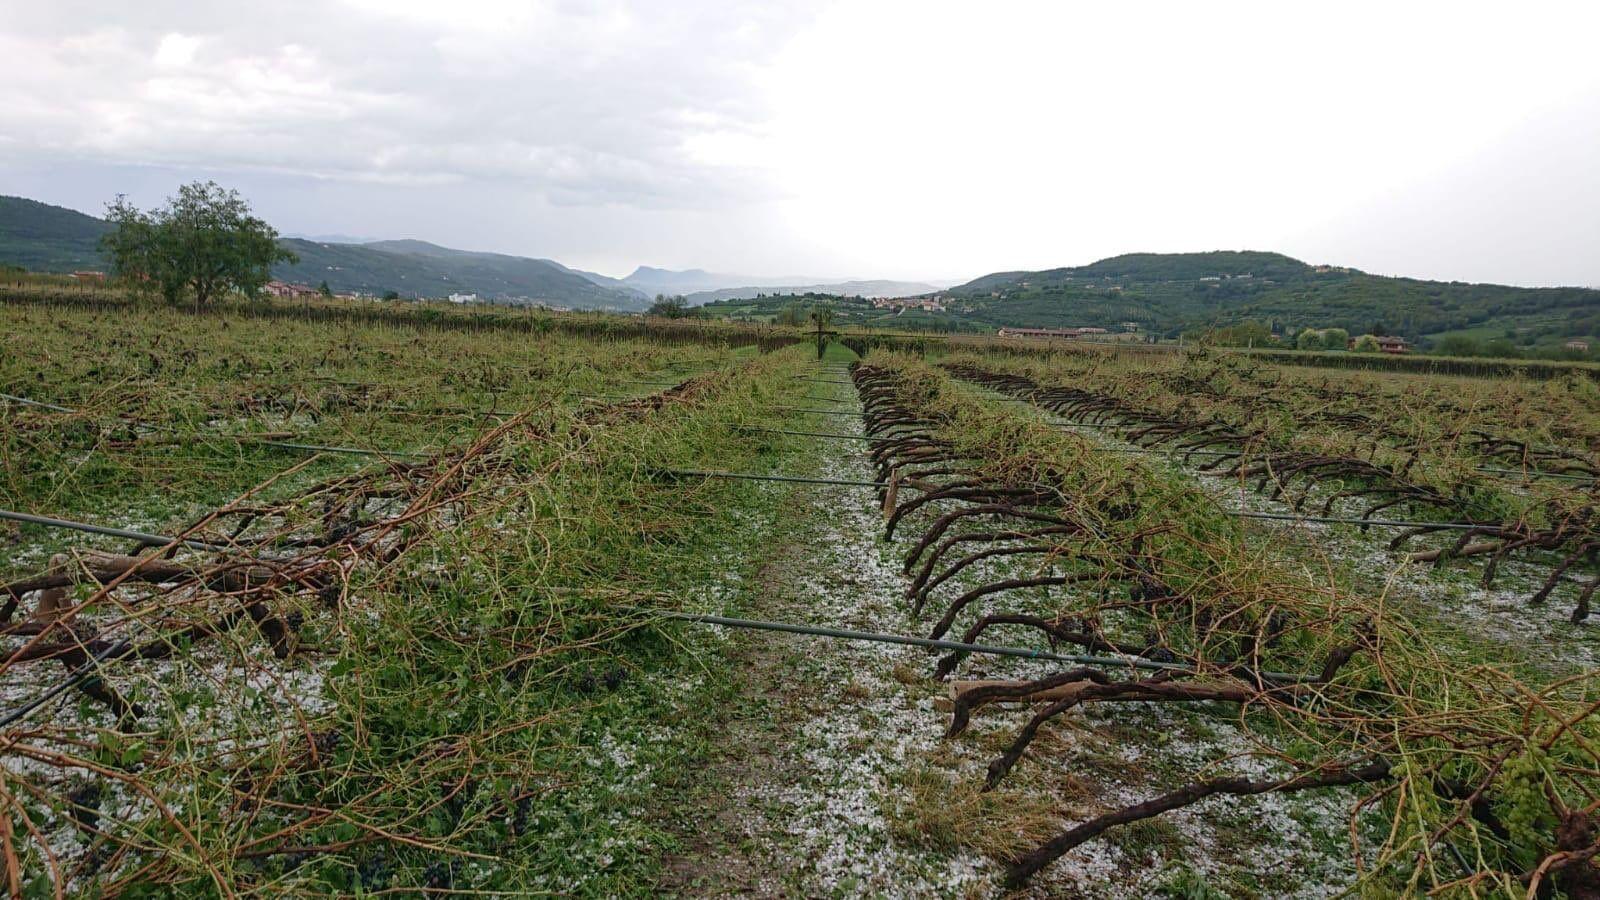 Ураган в Вероне уничтожил виноградники.